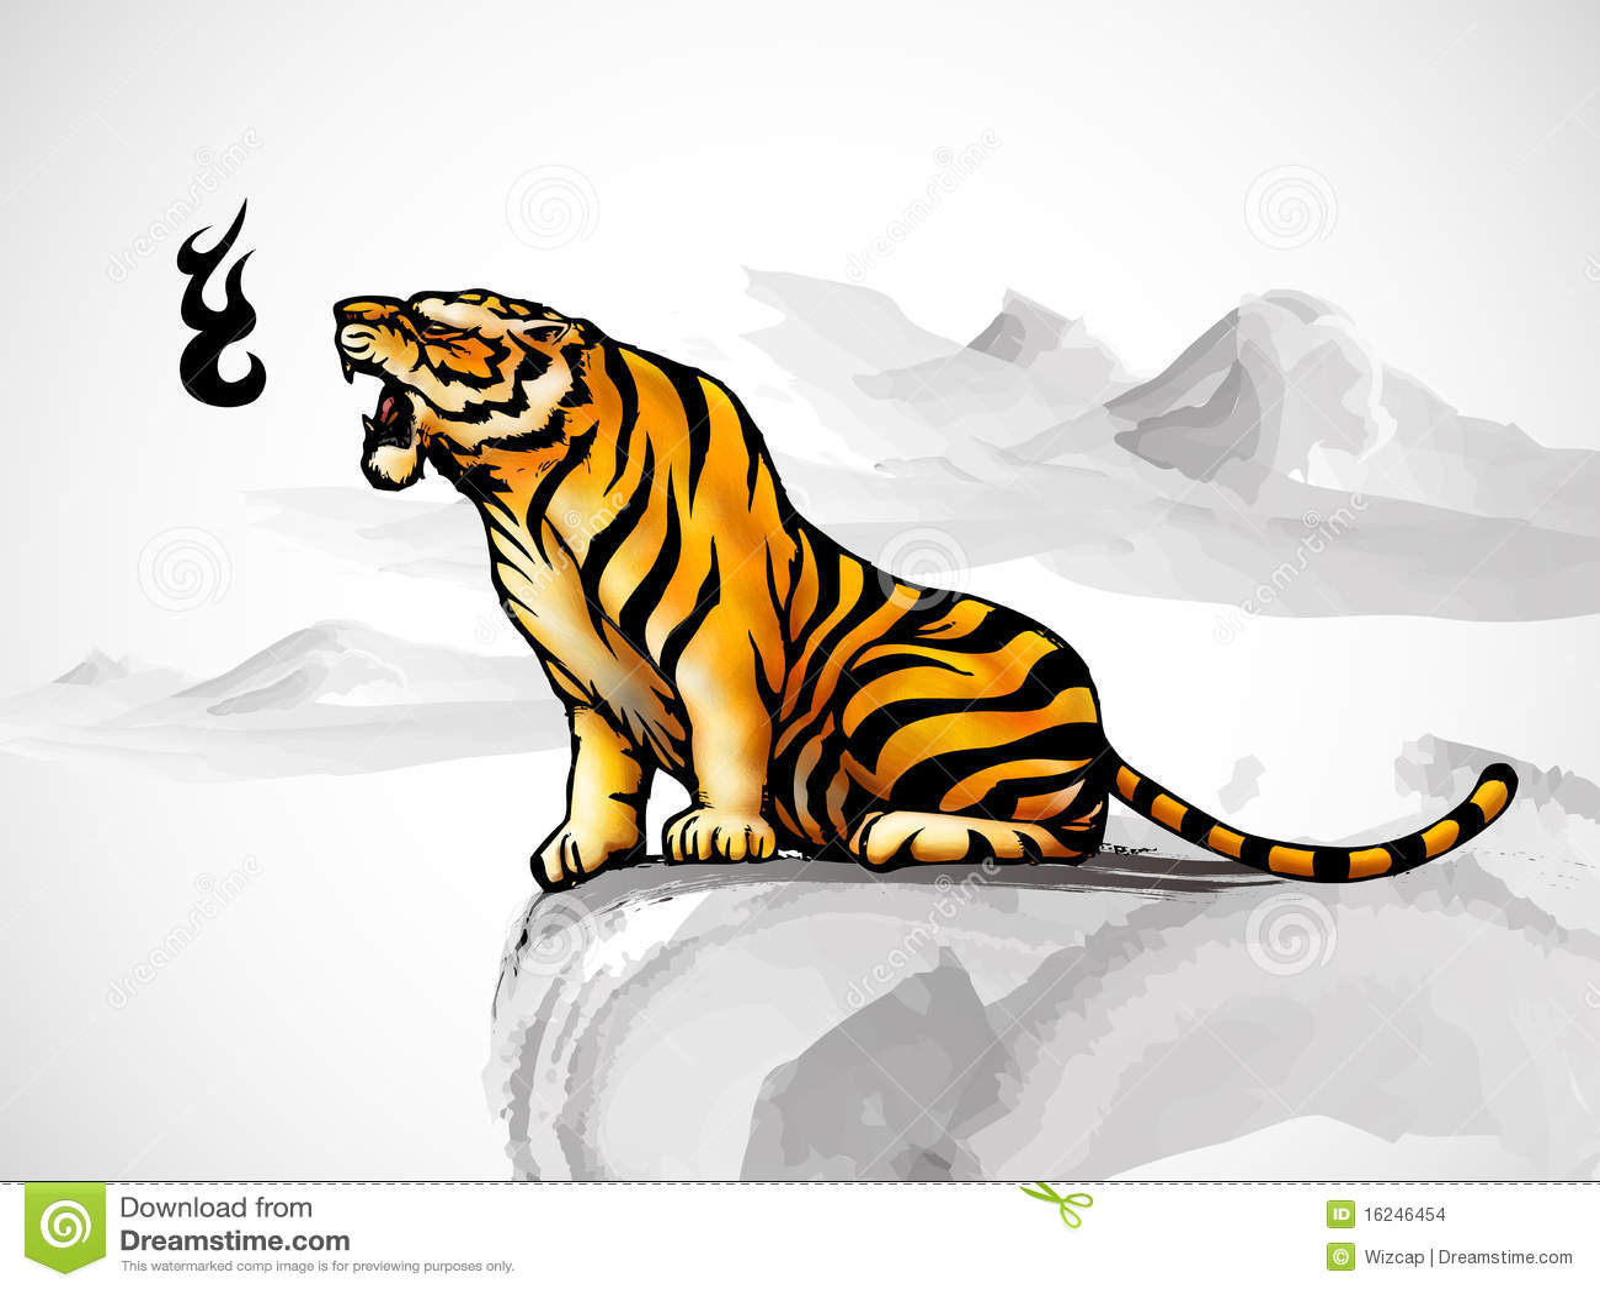 Ancient tiger symbol ancient tiger symbol photo8 biocorpaavc